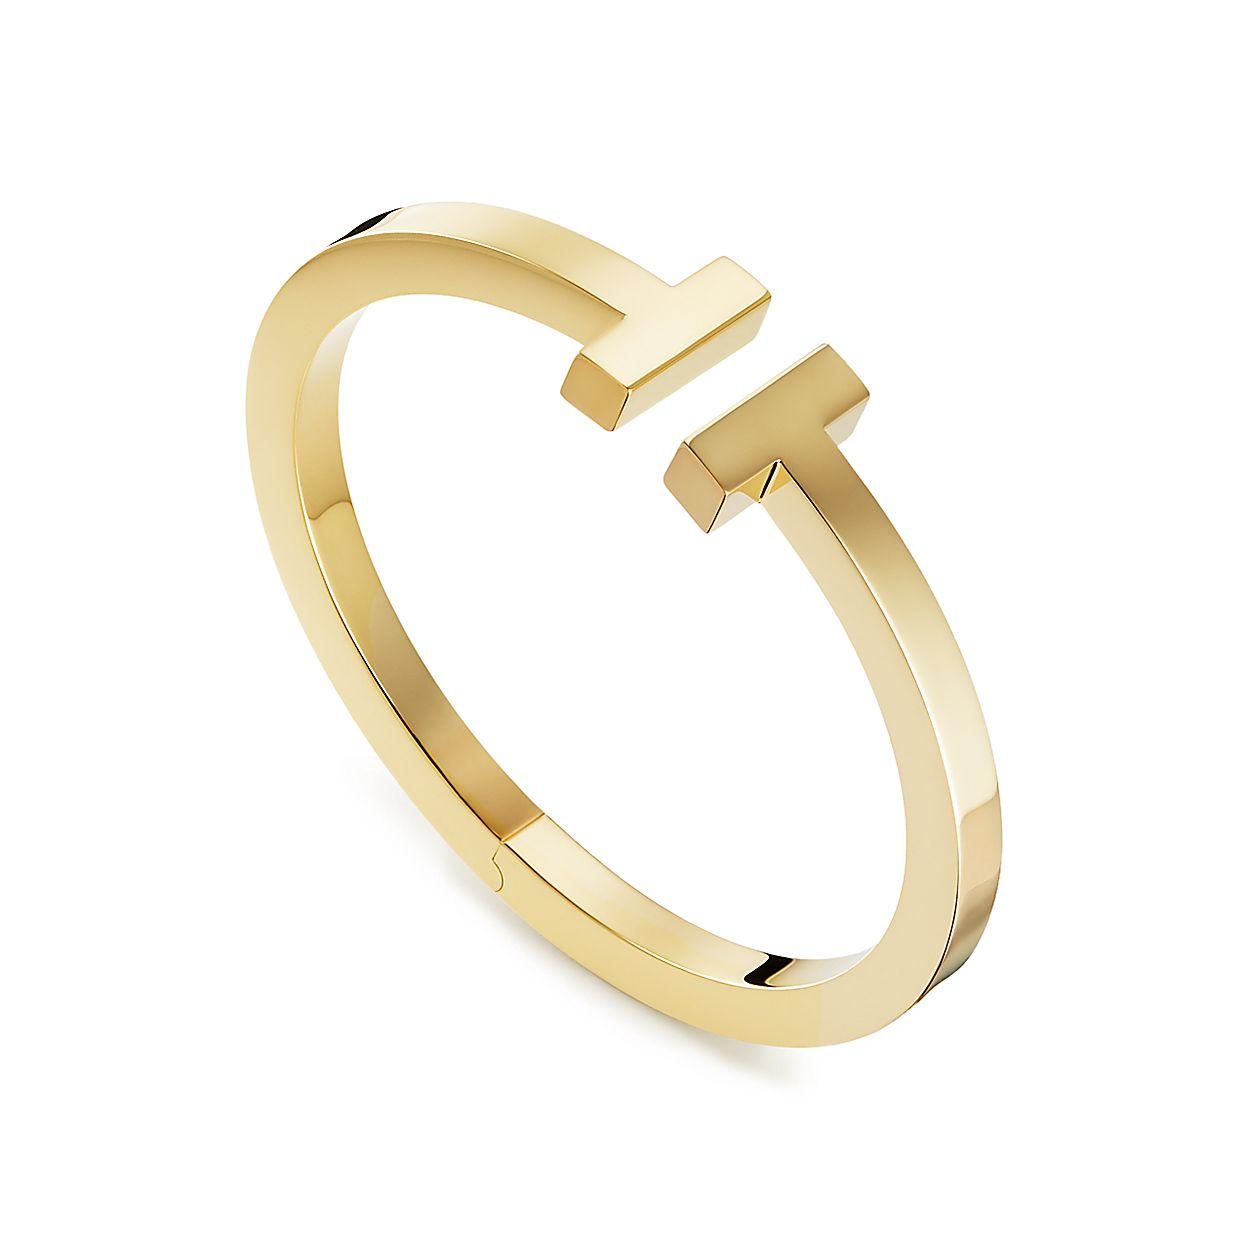 2851f8d65260 Bracelet Jewelry Pulseras Collares Llaveros t